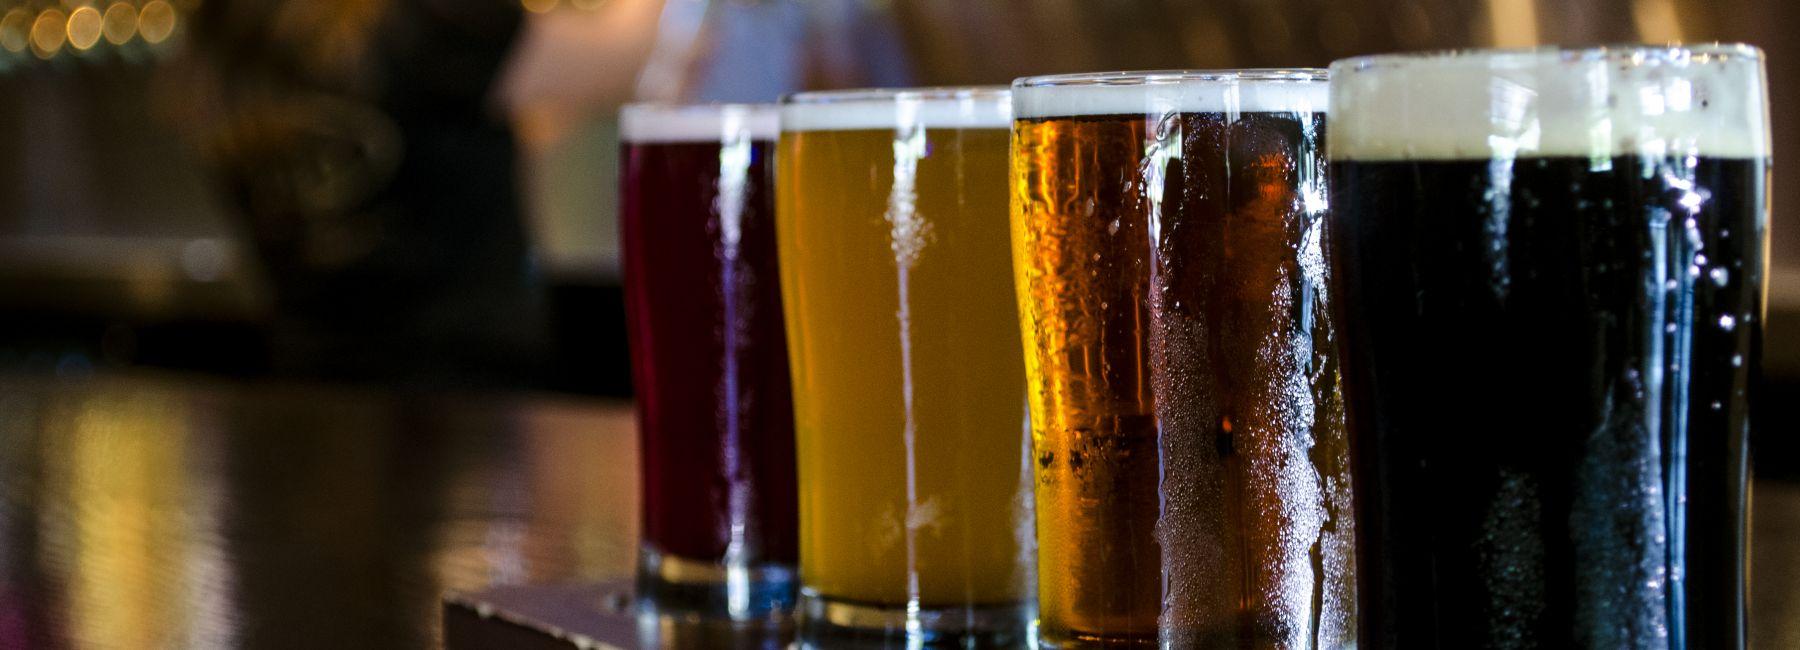 Flight of Craft Beer